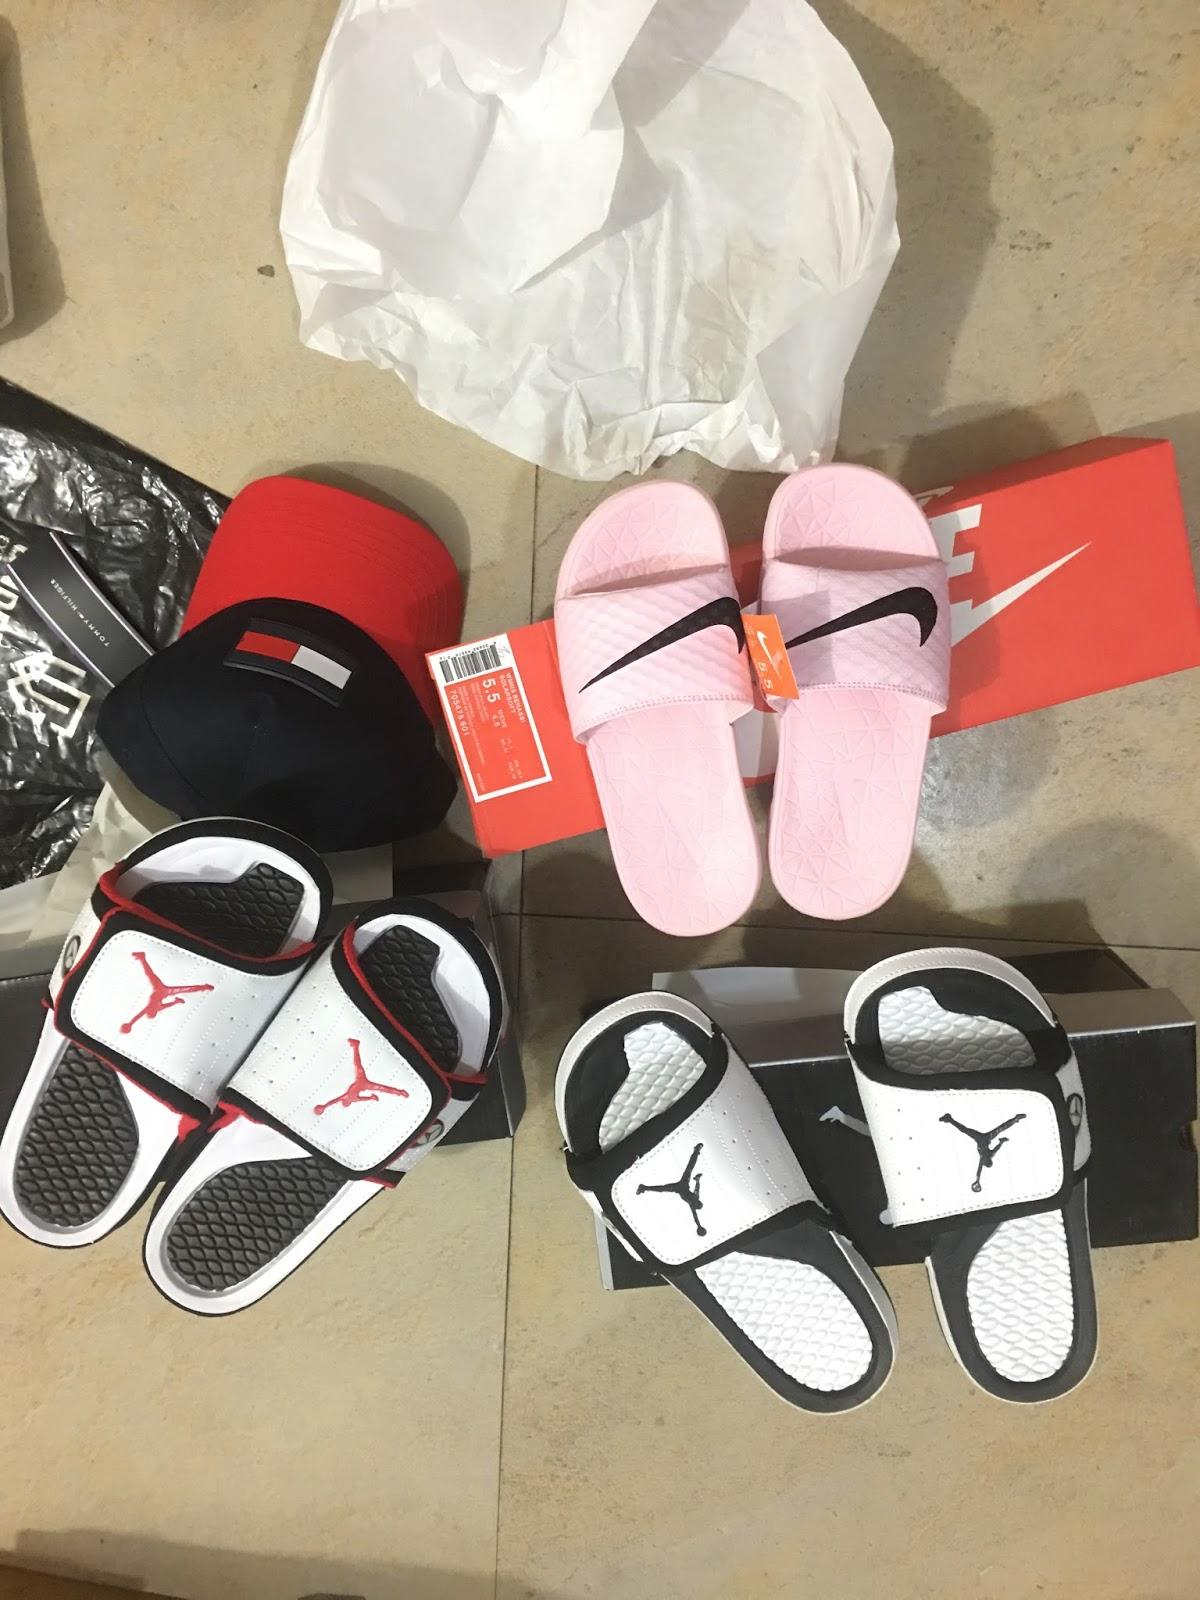 hot sale online a7593 0054c Nike Air Vapormax TN Plus,nike air vapormax plus 2018,Nike ...